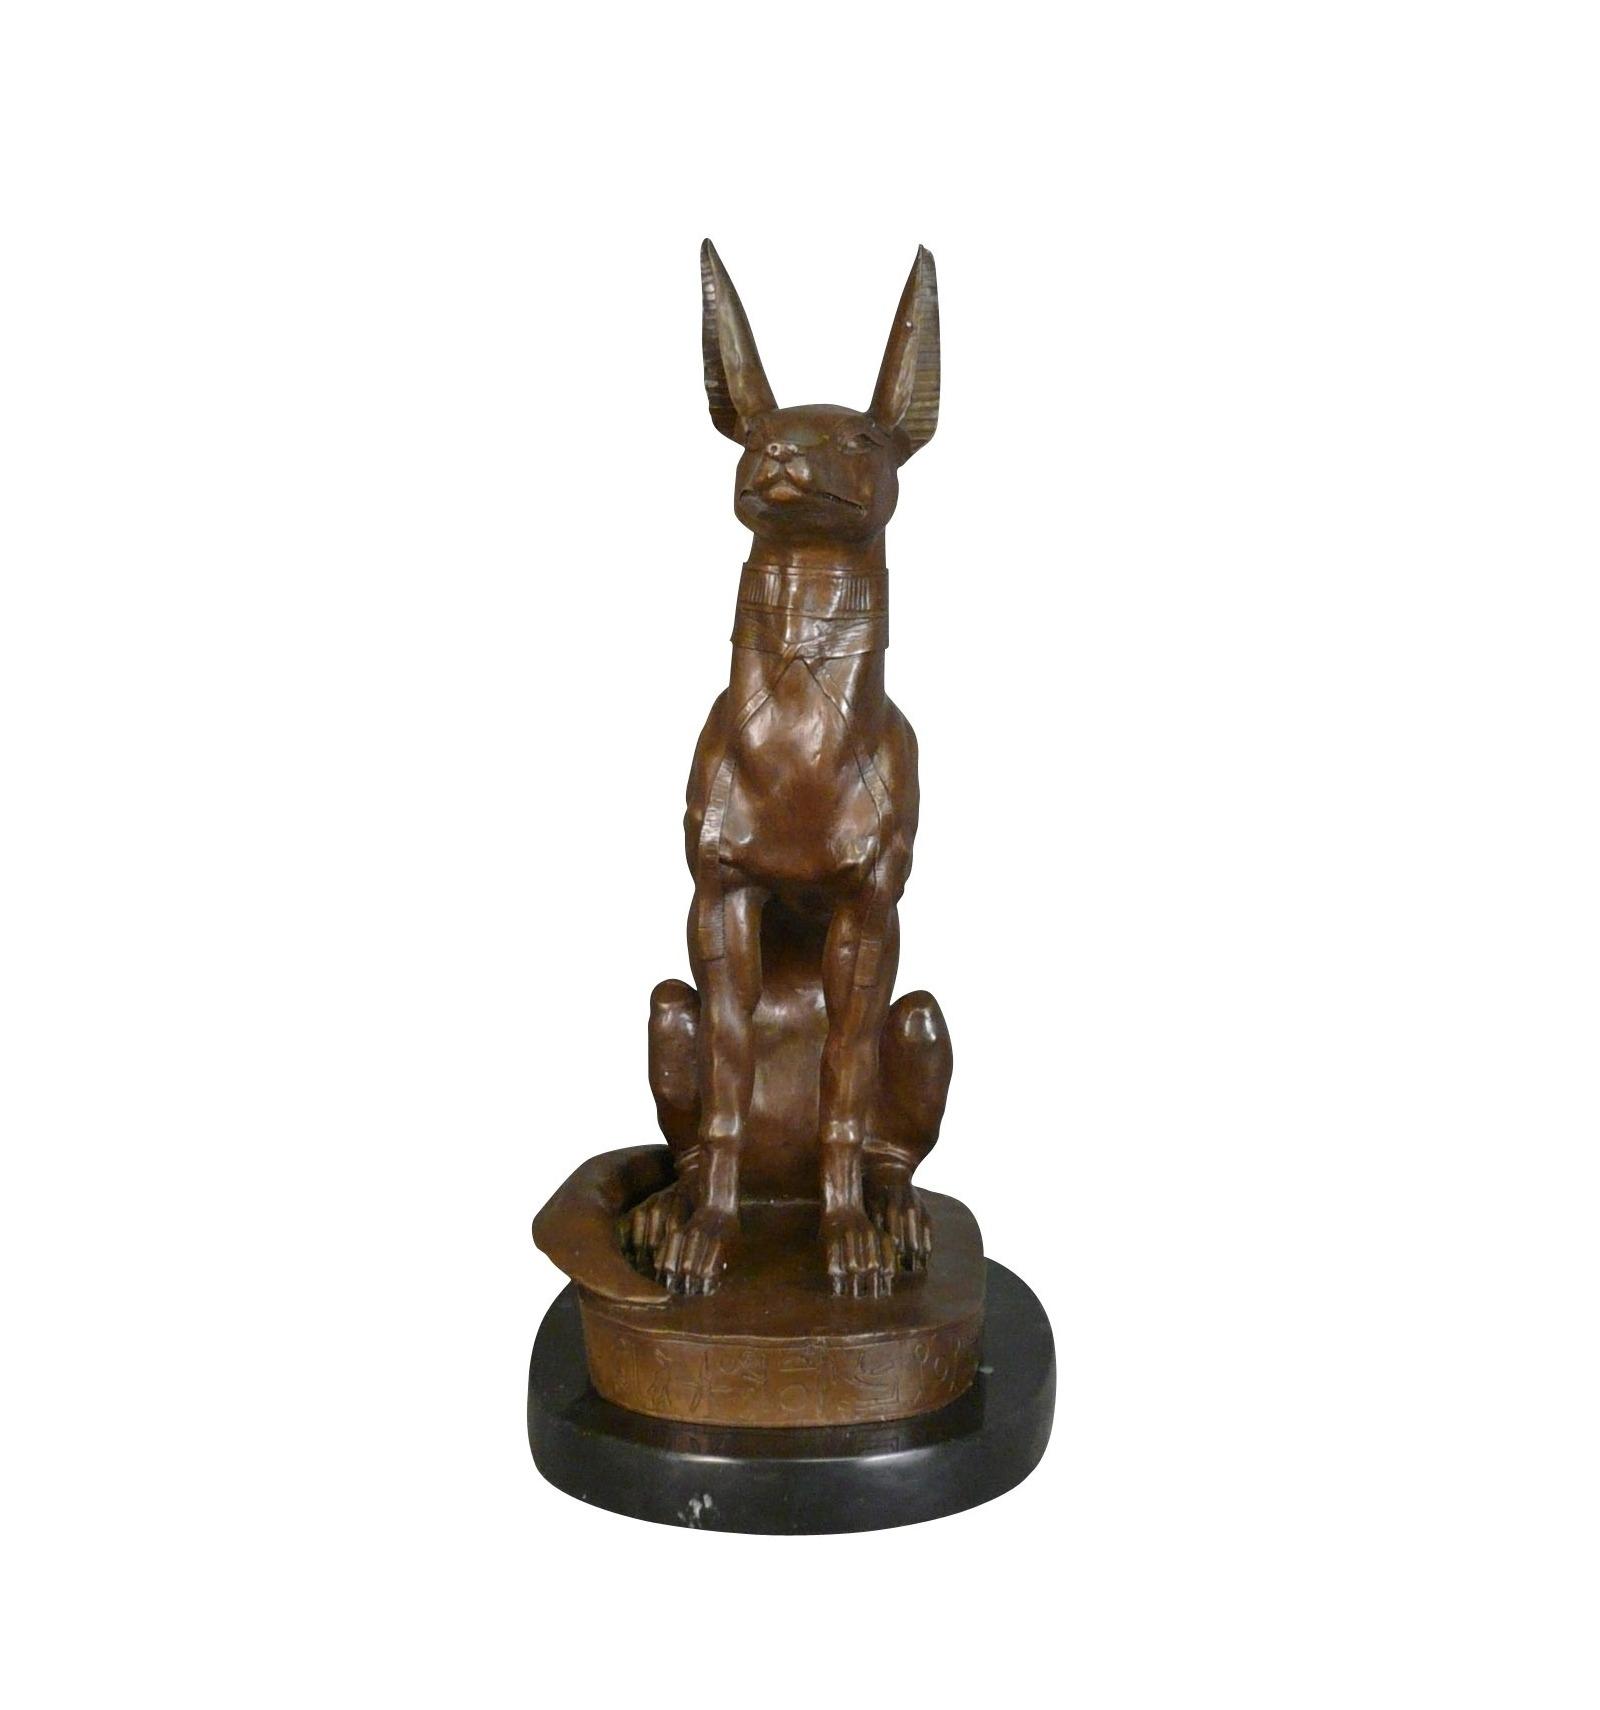 The God Anubis Egypt Mythology Bronze Statue